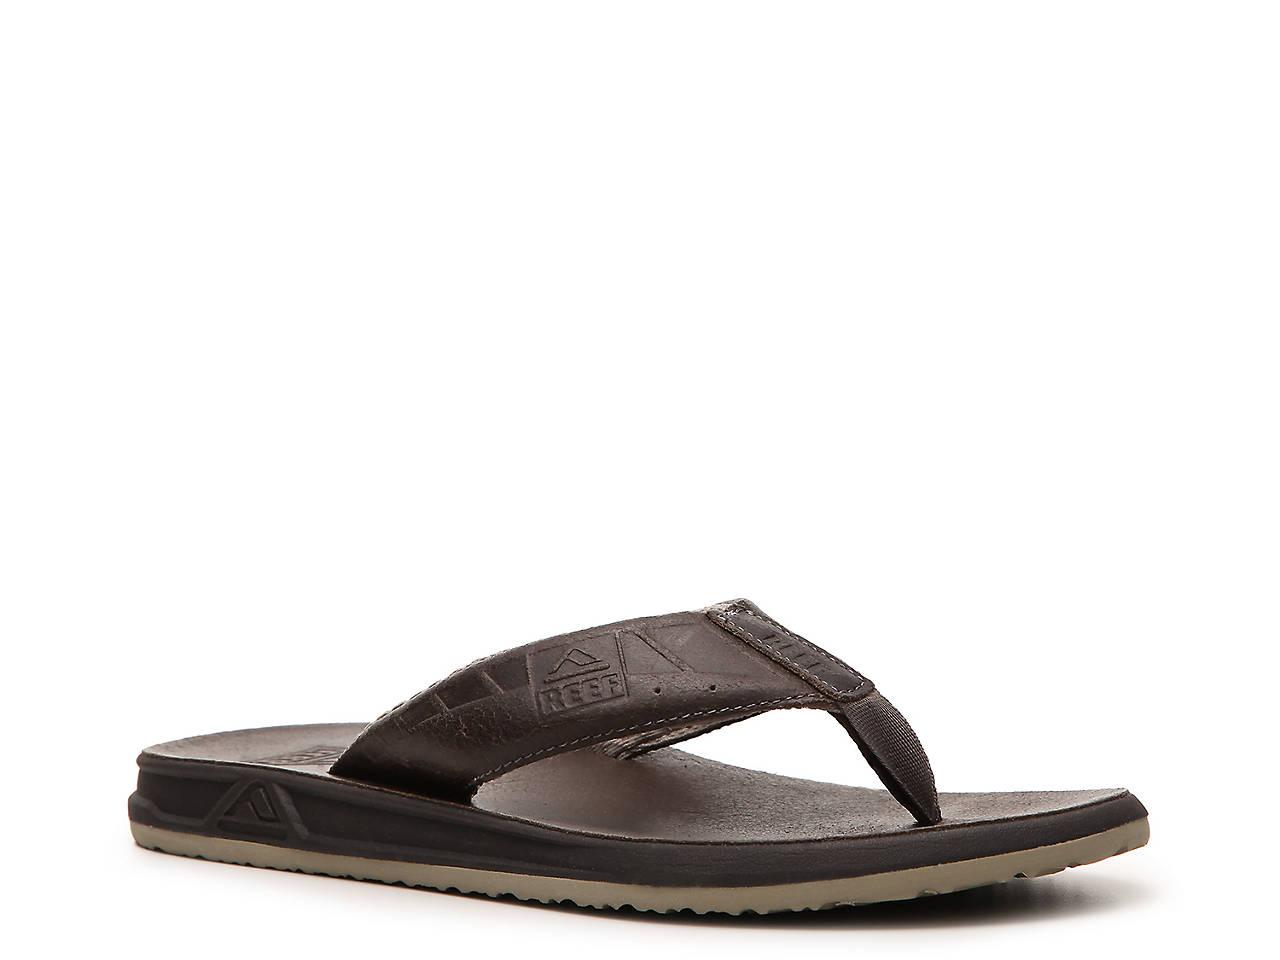 037e081e274 Reef Phantom Ultimate Flip Flop Men s Shoes